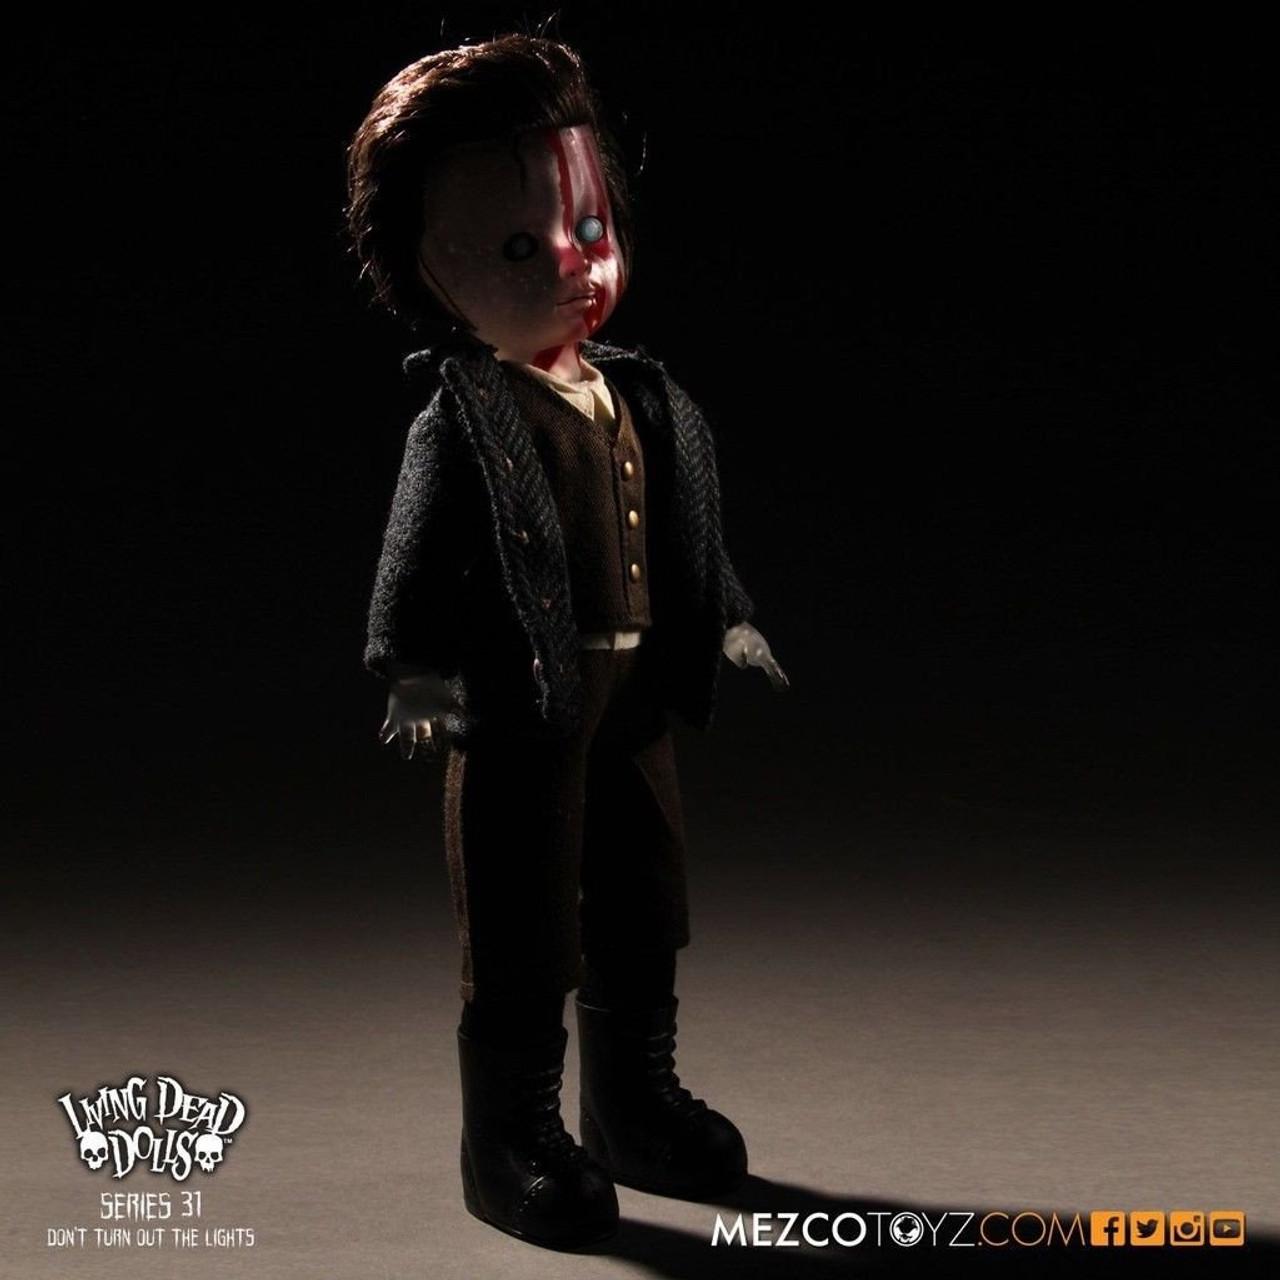 Kreek - Living Dead Dolls Series 31